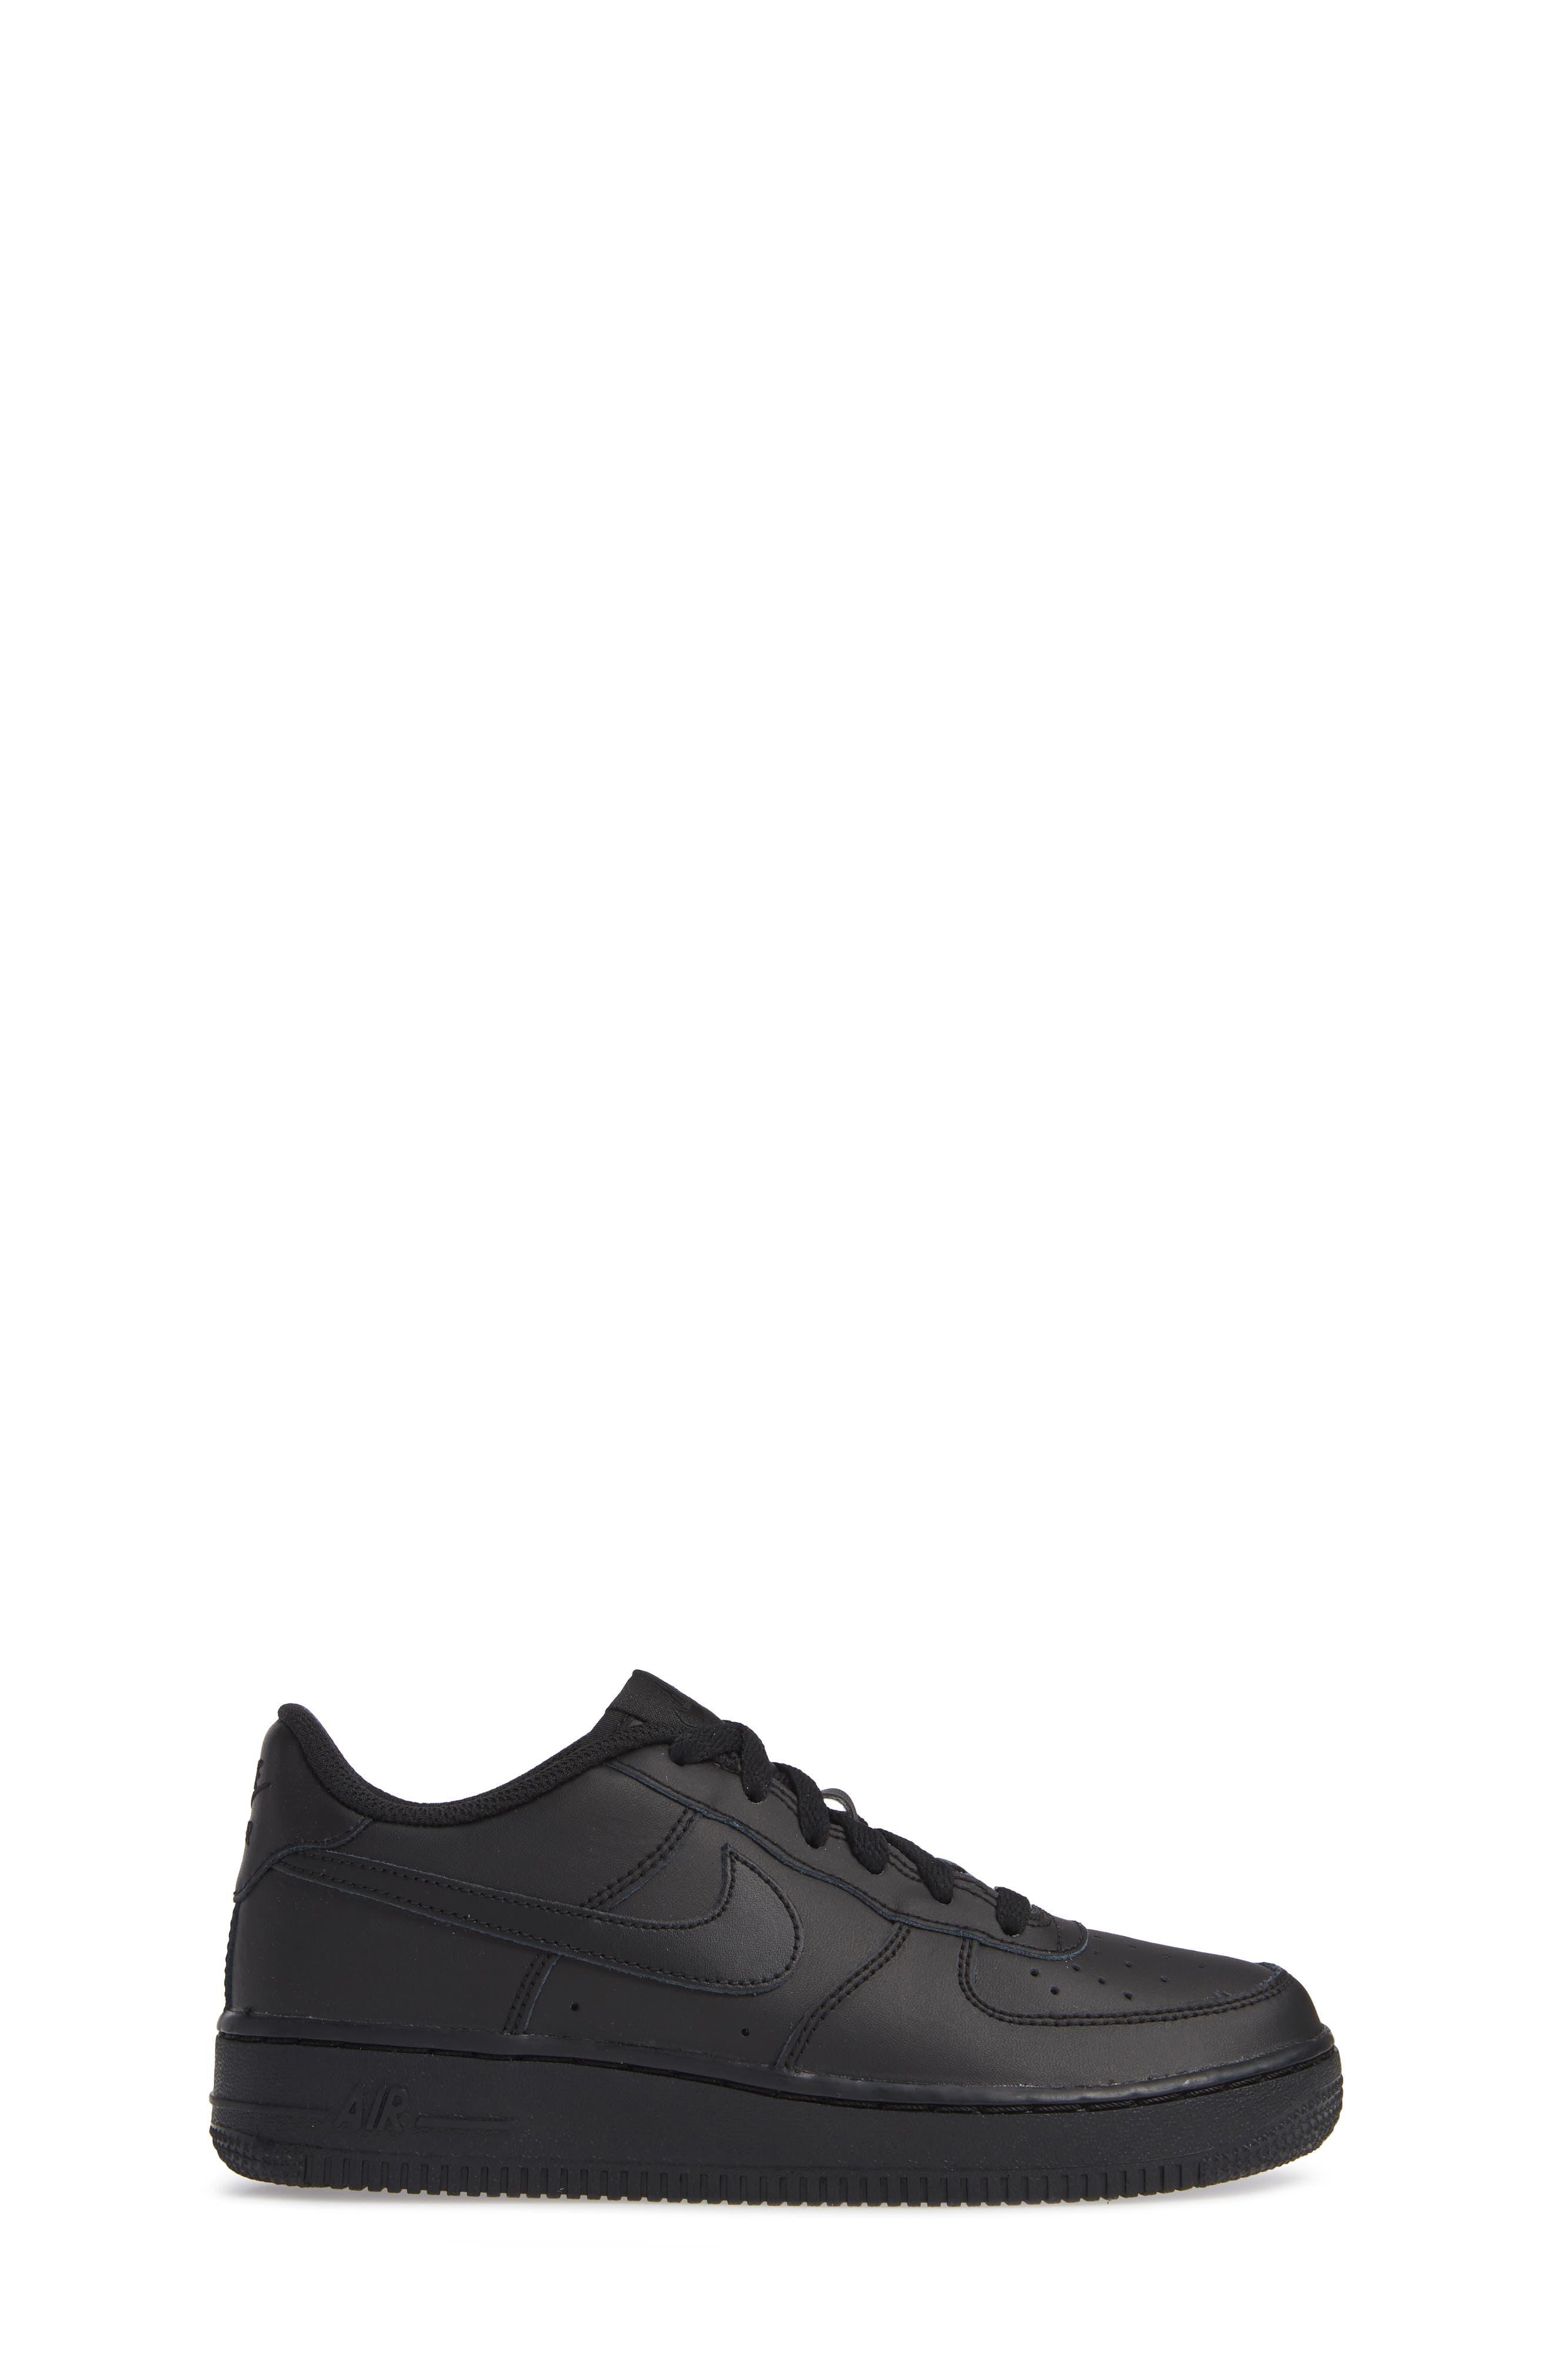 Air Force 1 Sneaker,                             Alternate thumbnail 3, color,                             BLACK/ BLACK/ BLACK